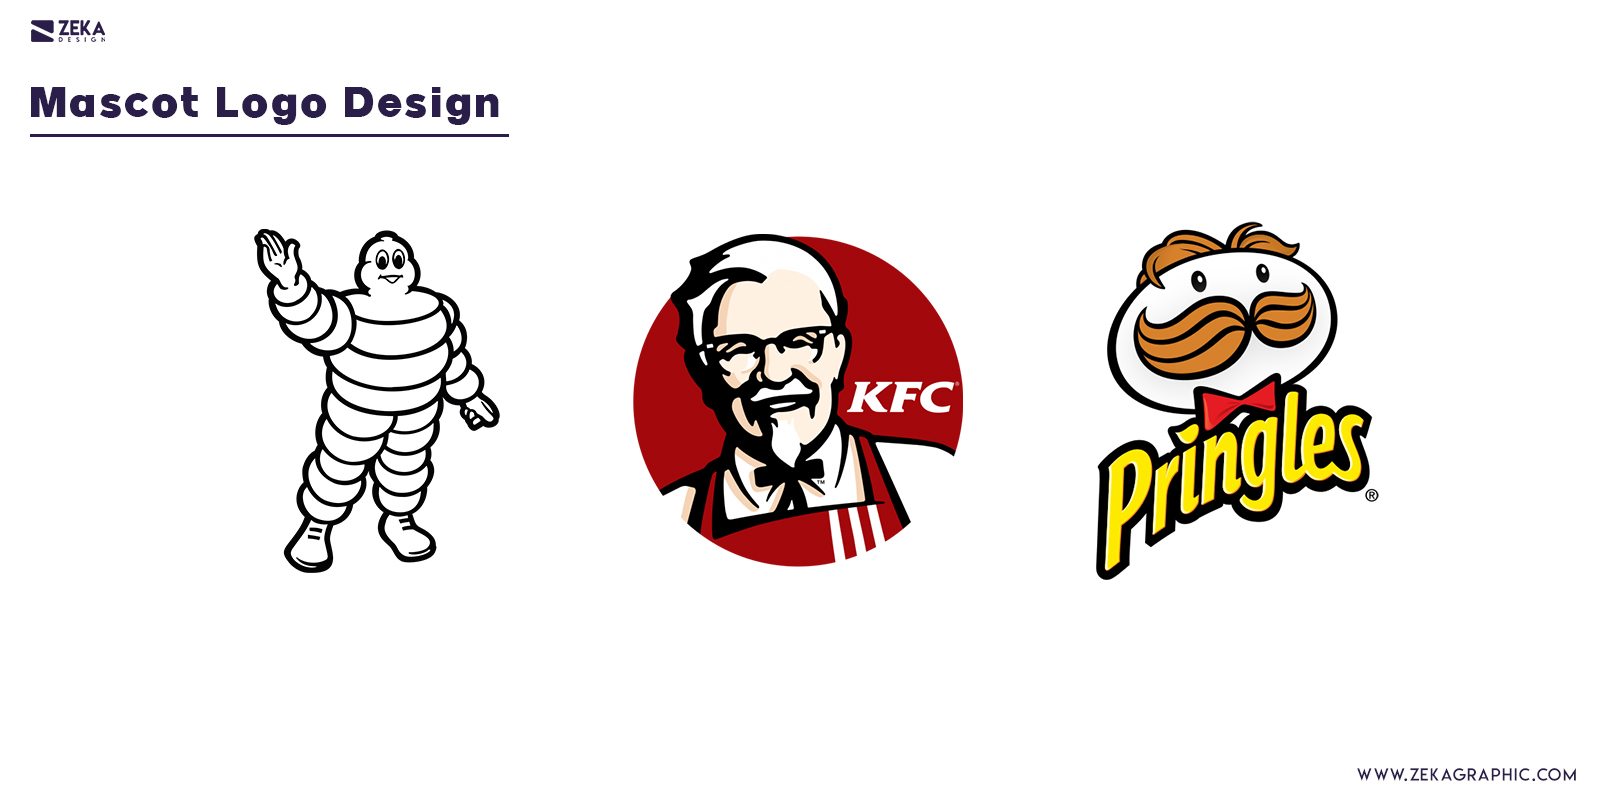 Mascot Logo Design Type Graphic Design Blog Inspiration